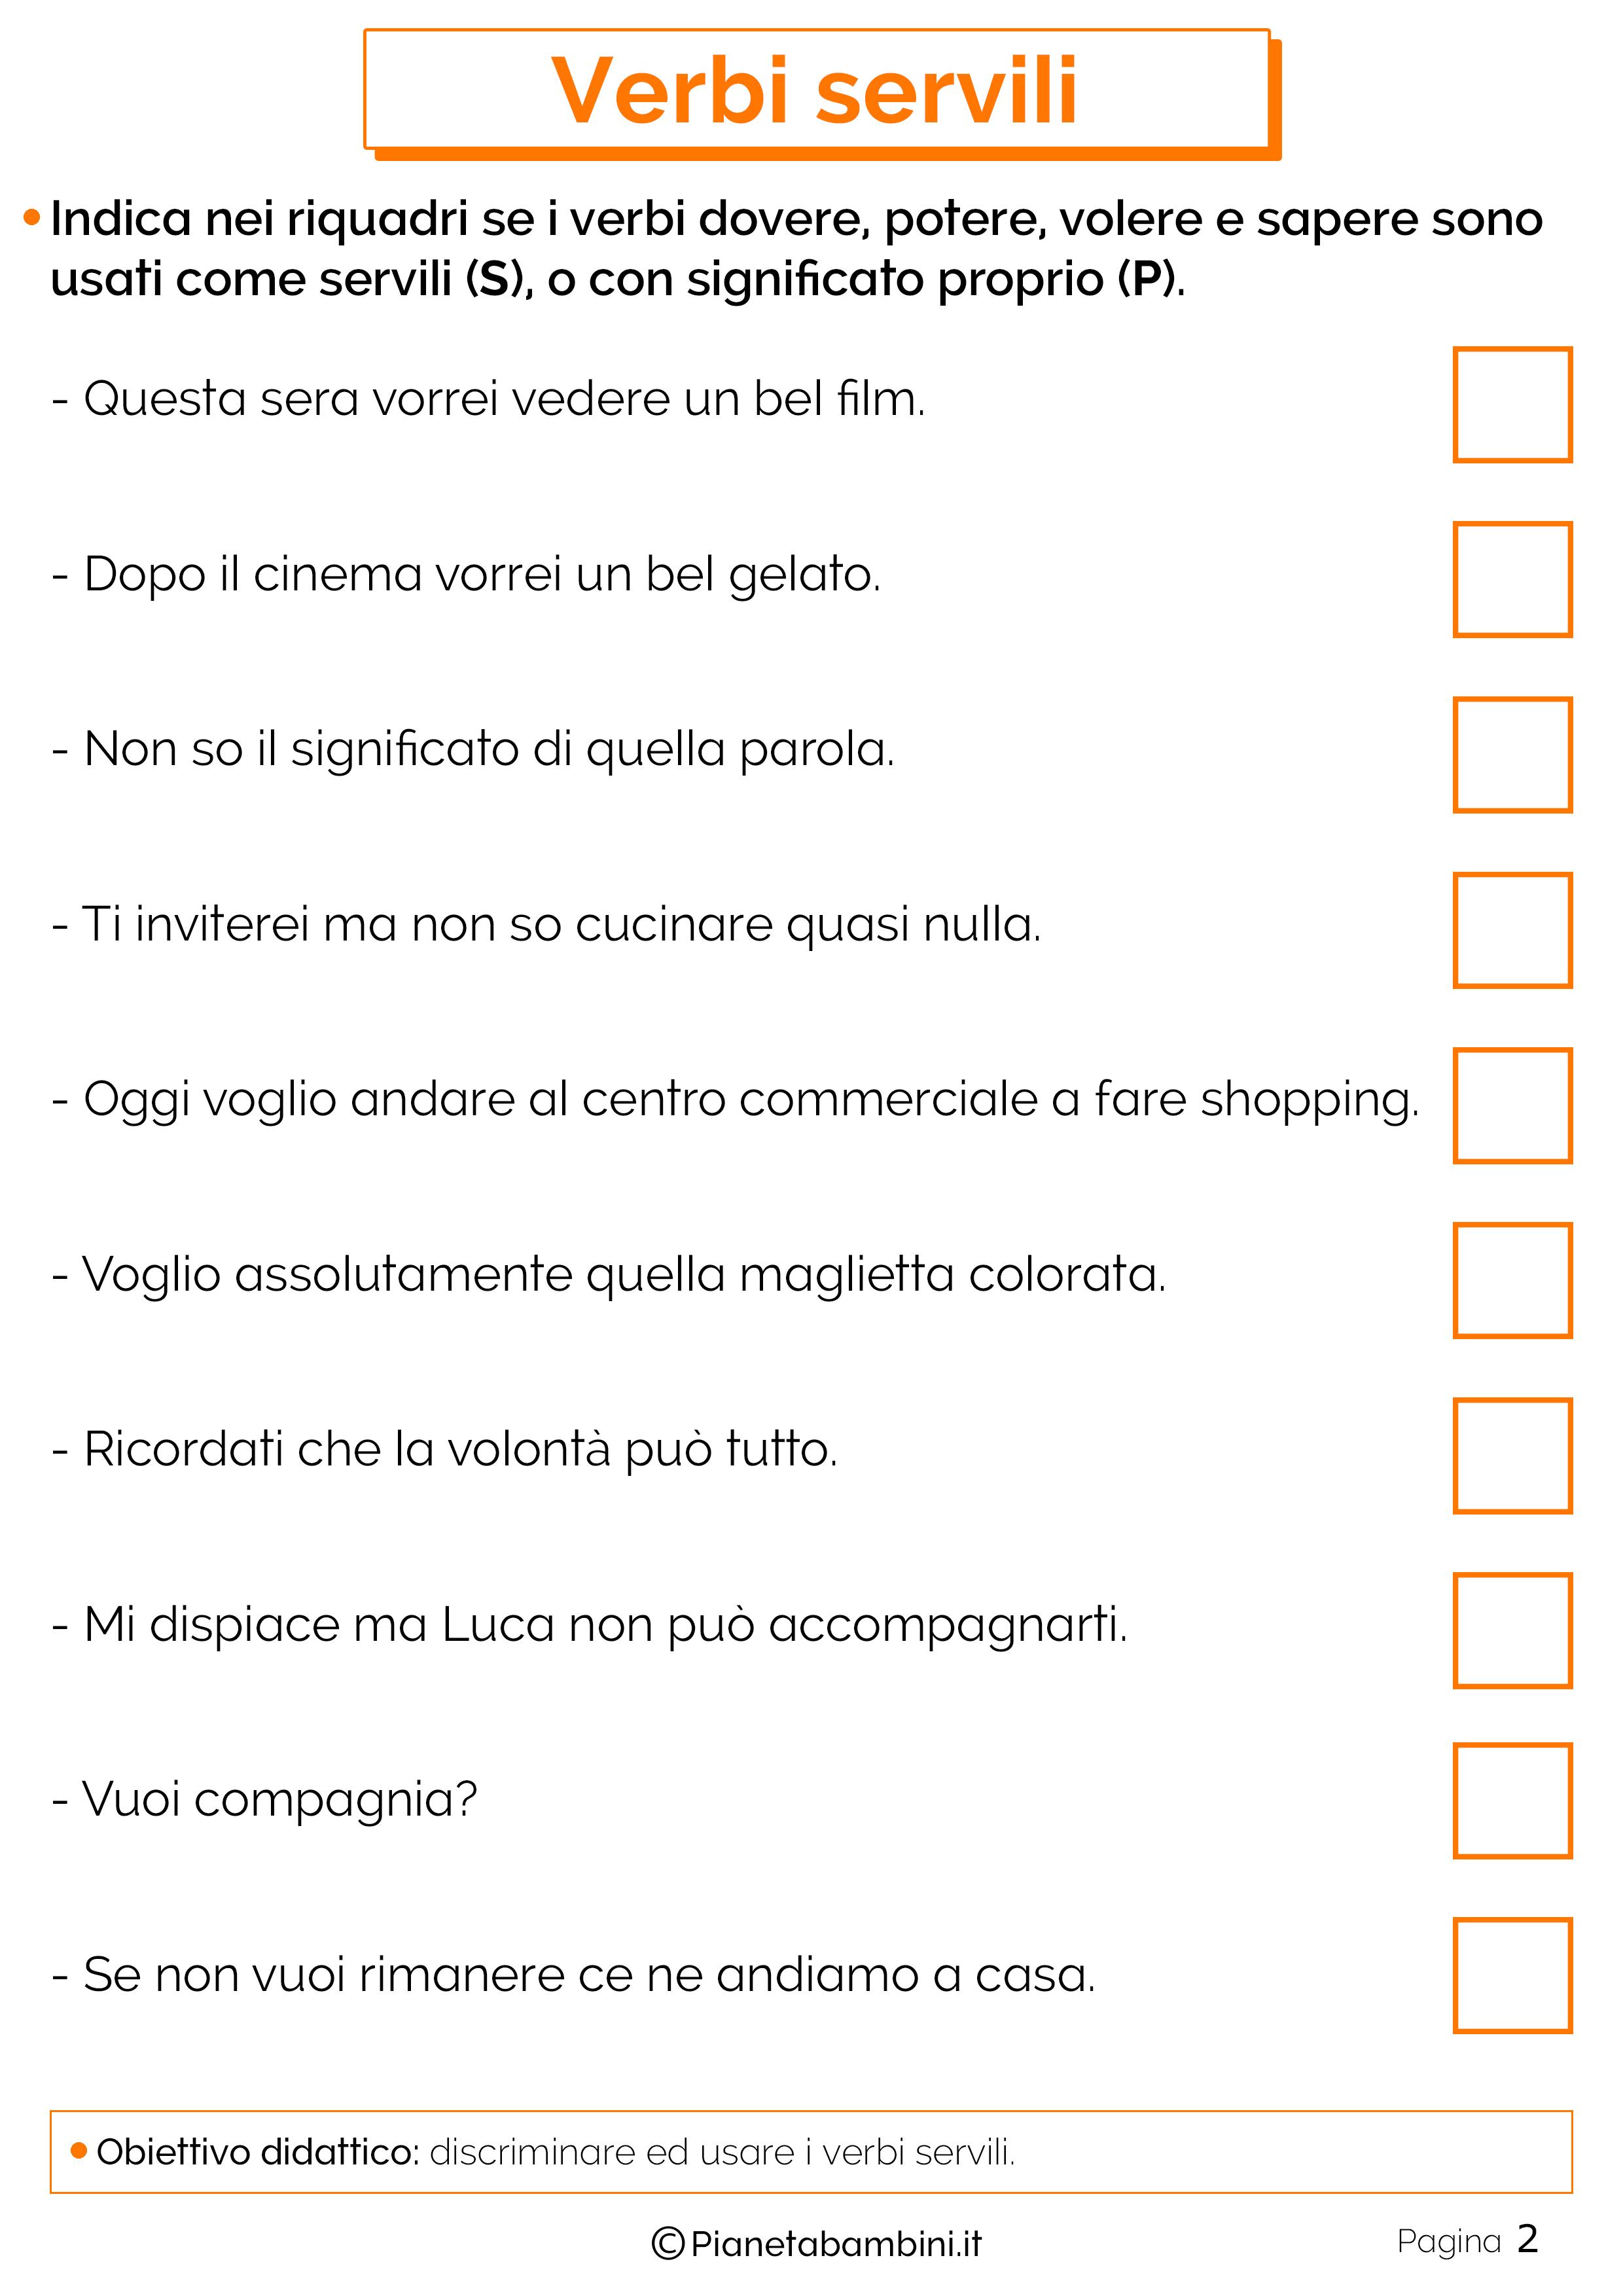 Schede didattiche sui verbi servili 2